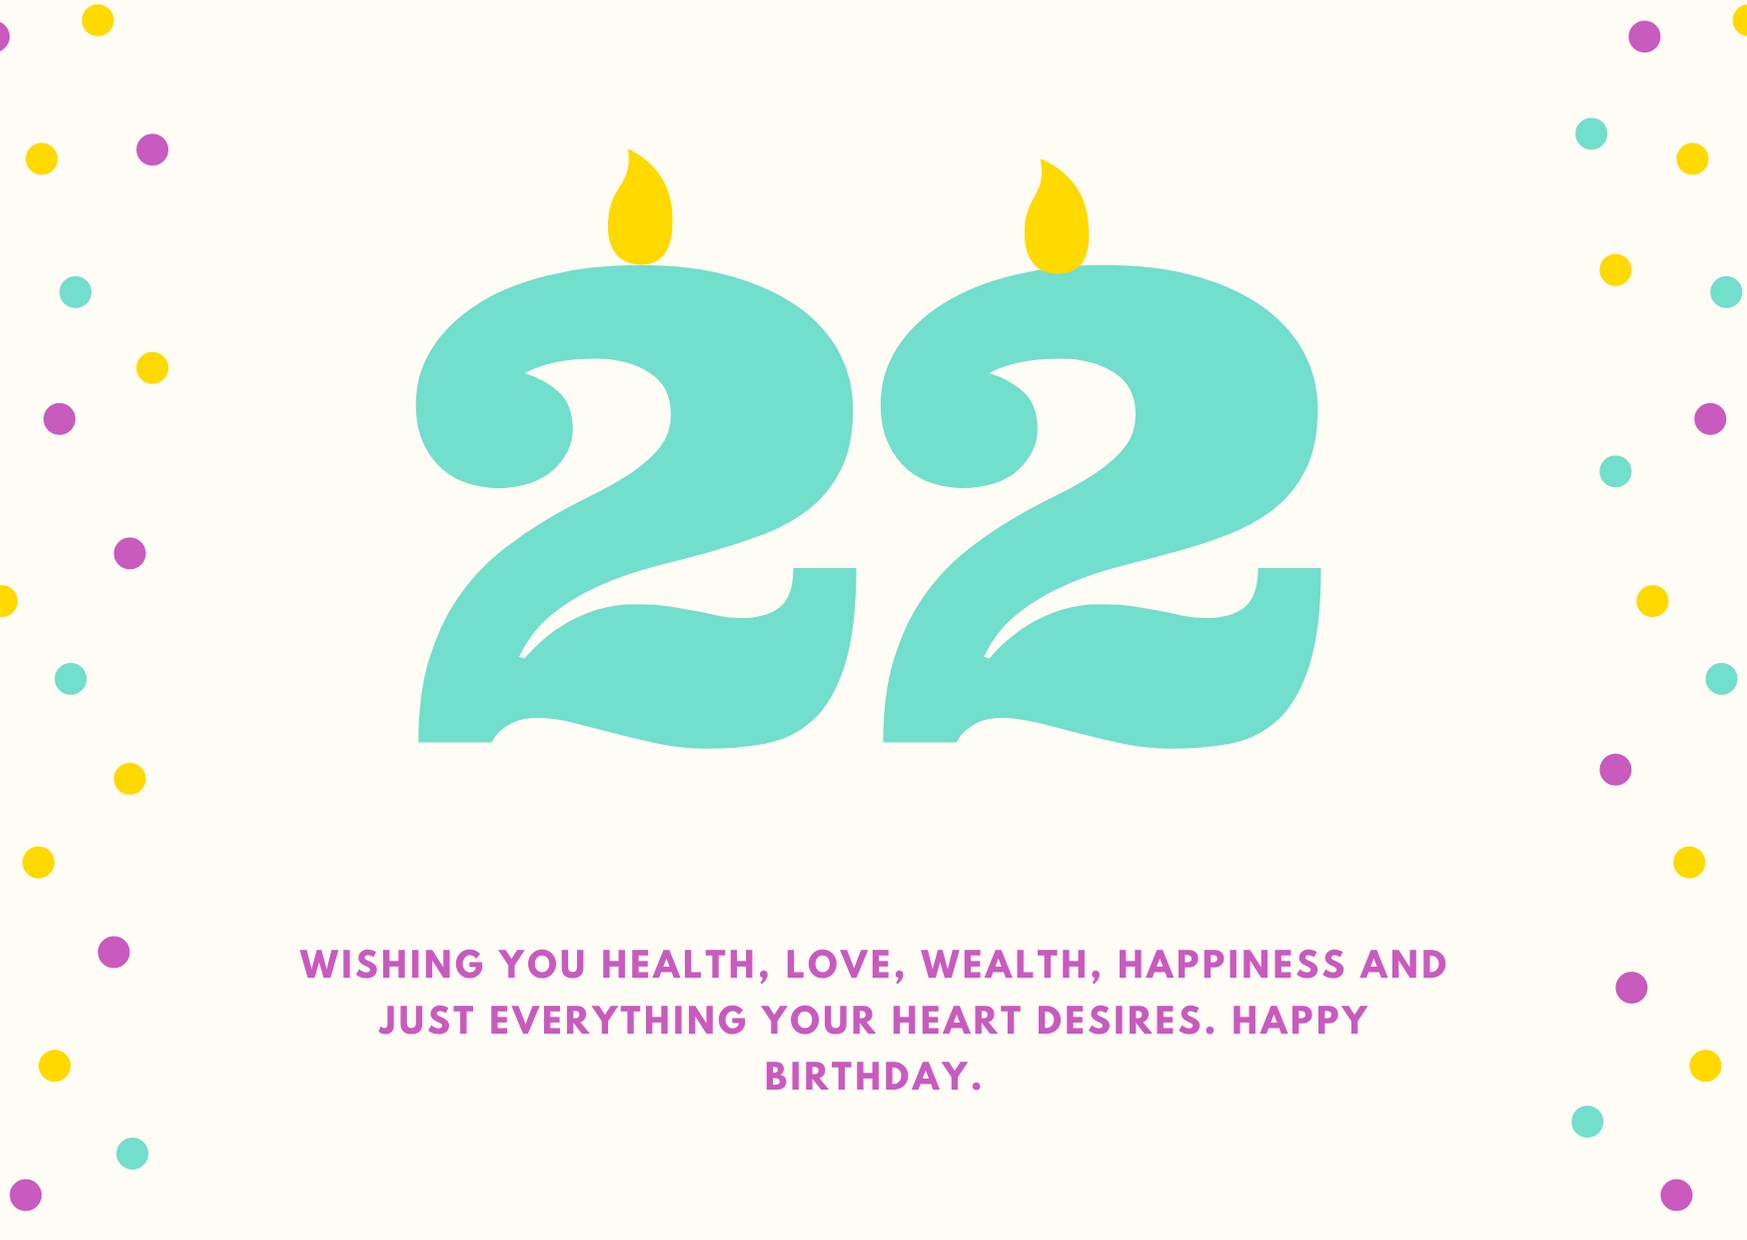 happy 22nd birthday wishes